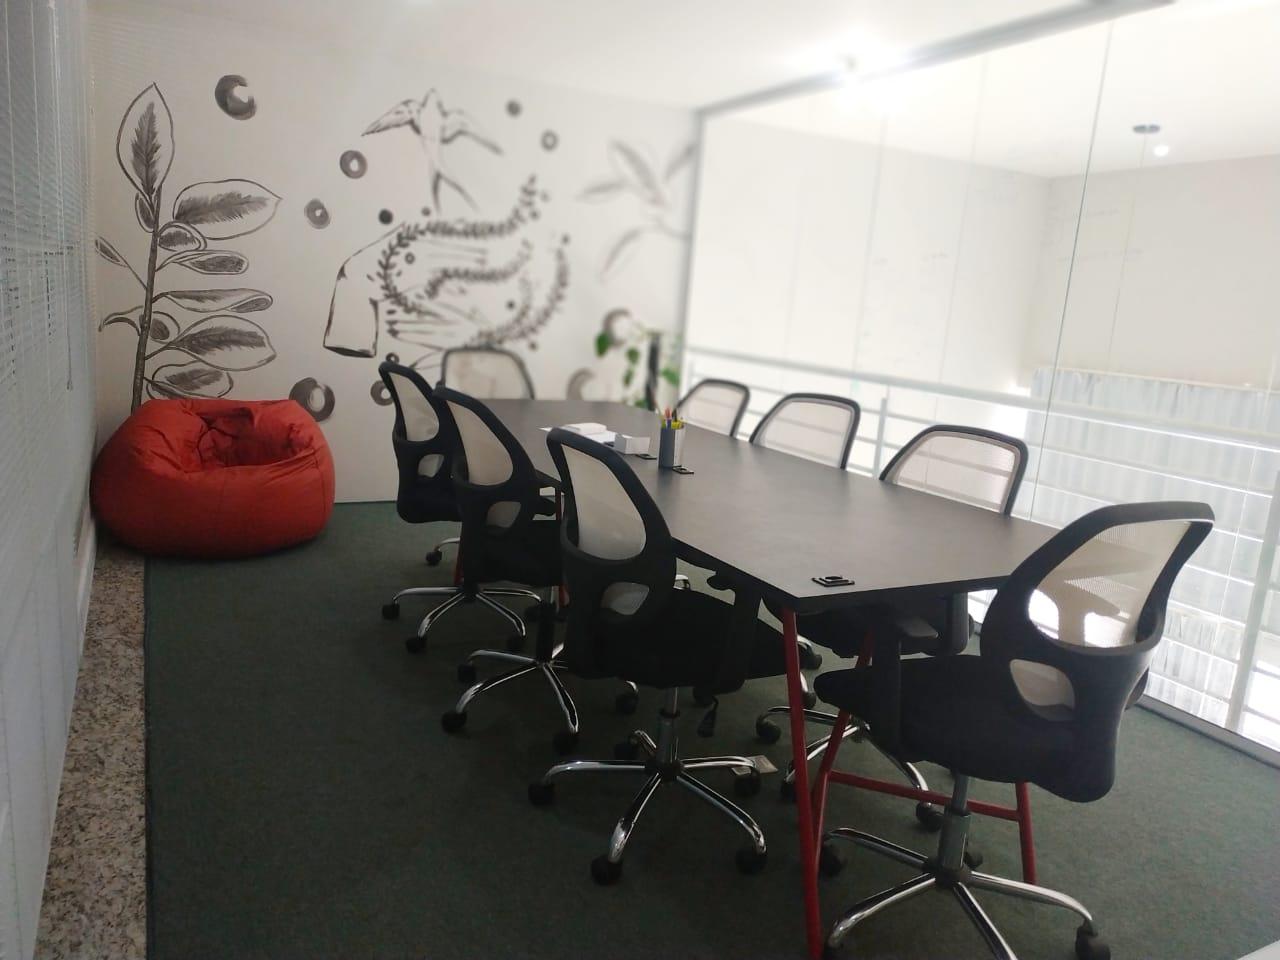 sala de reuniões I.jpeg